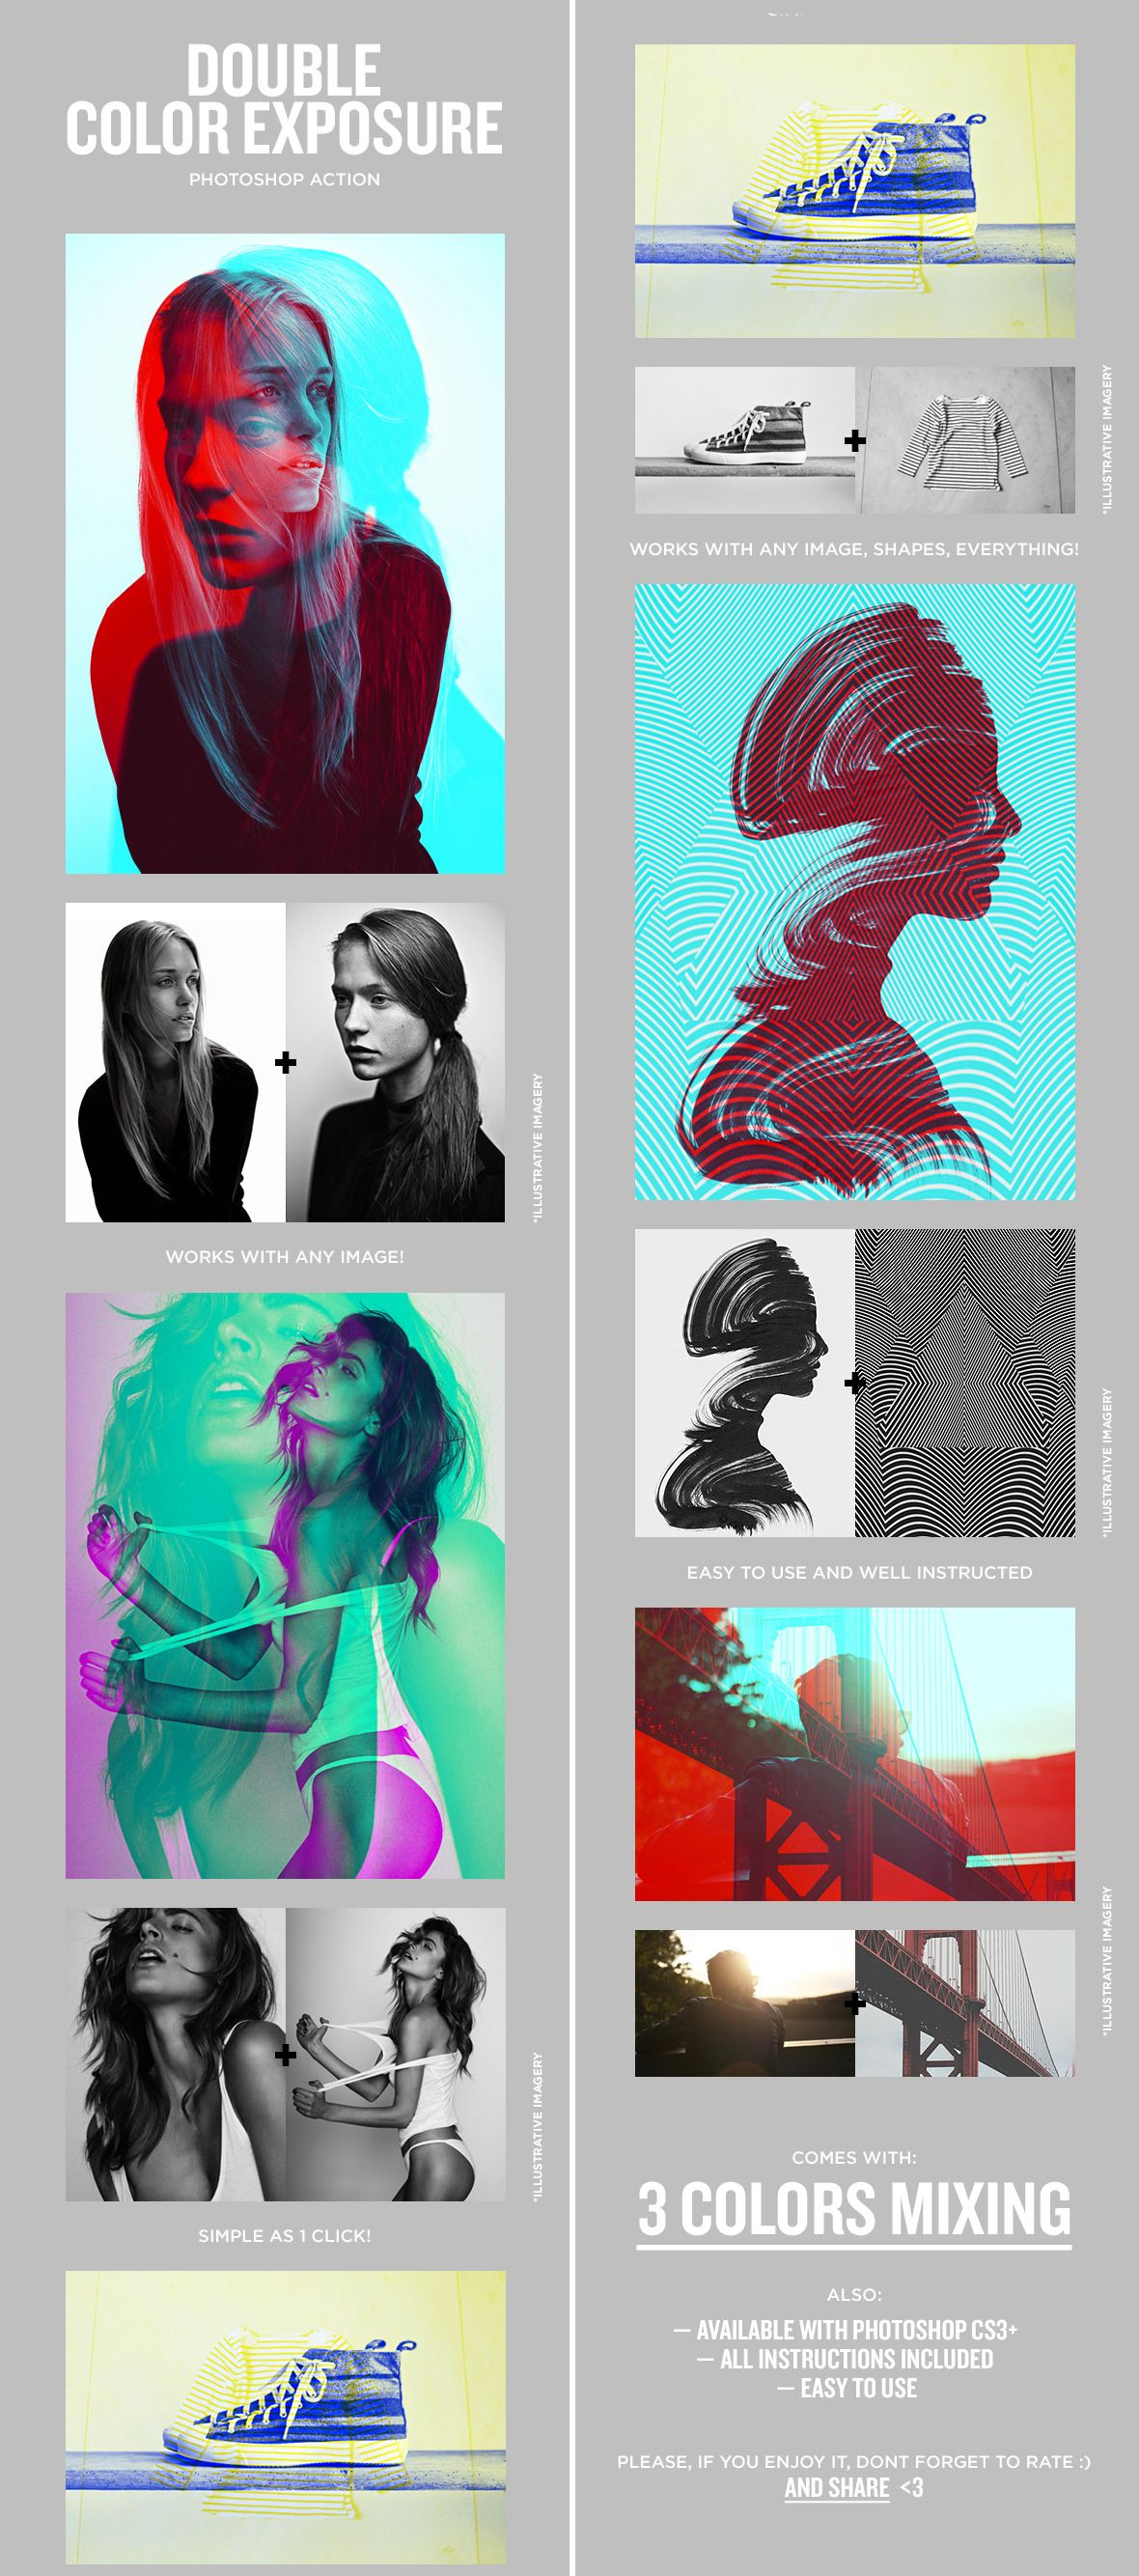 Double Color Exposure  Download here: https://graphicriver.net/item/double-color-exposure/11709694?ref=KlitVogli